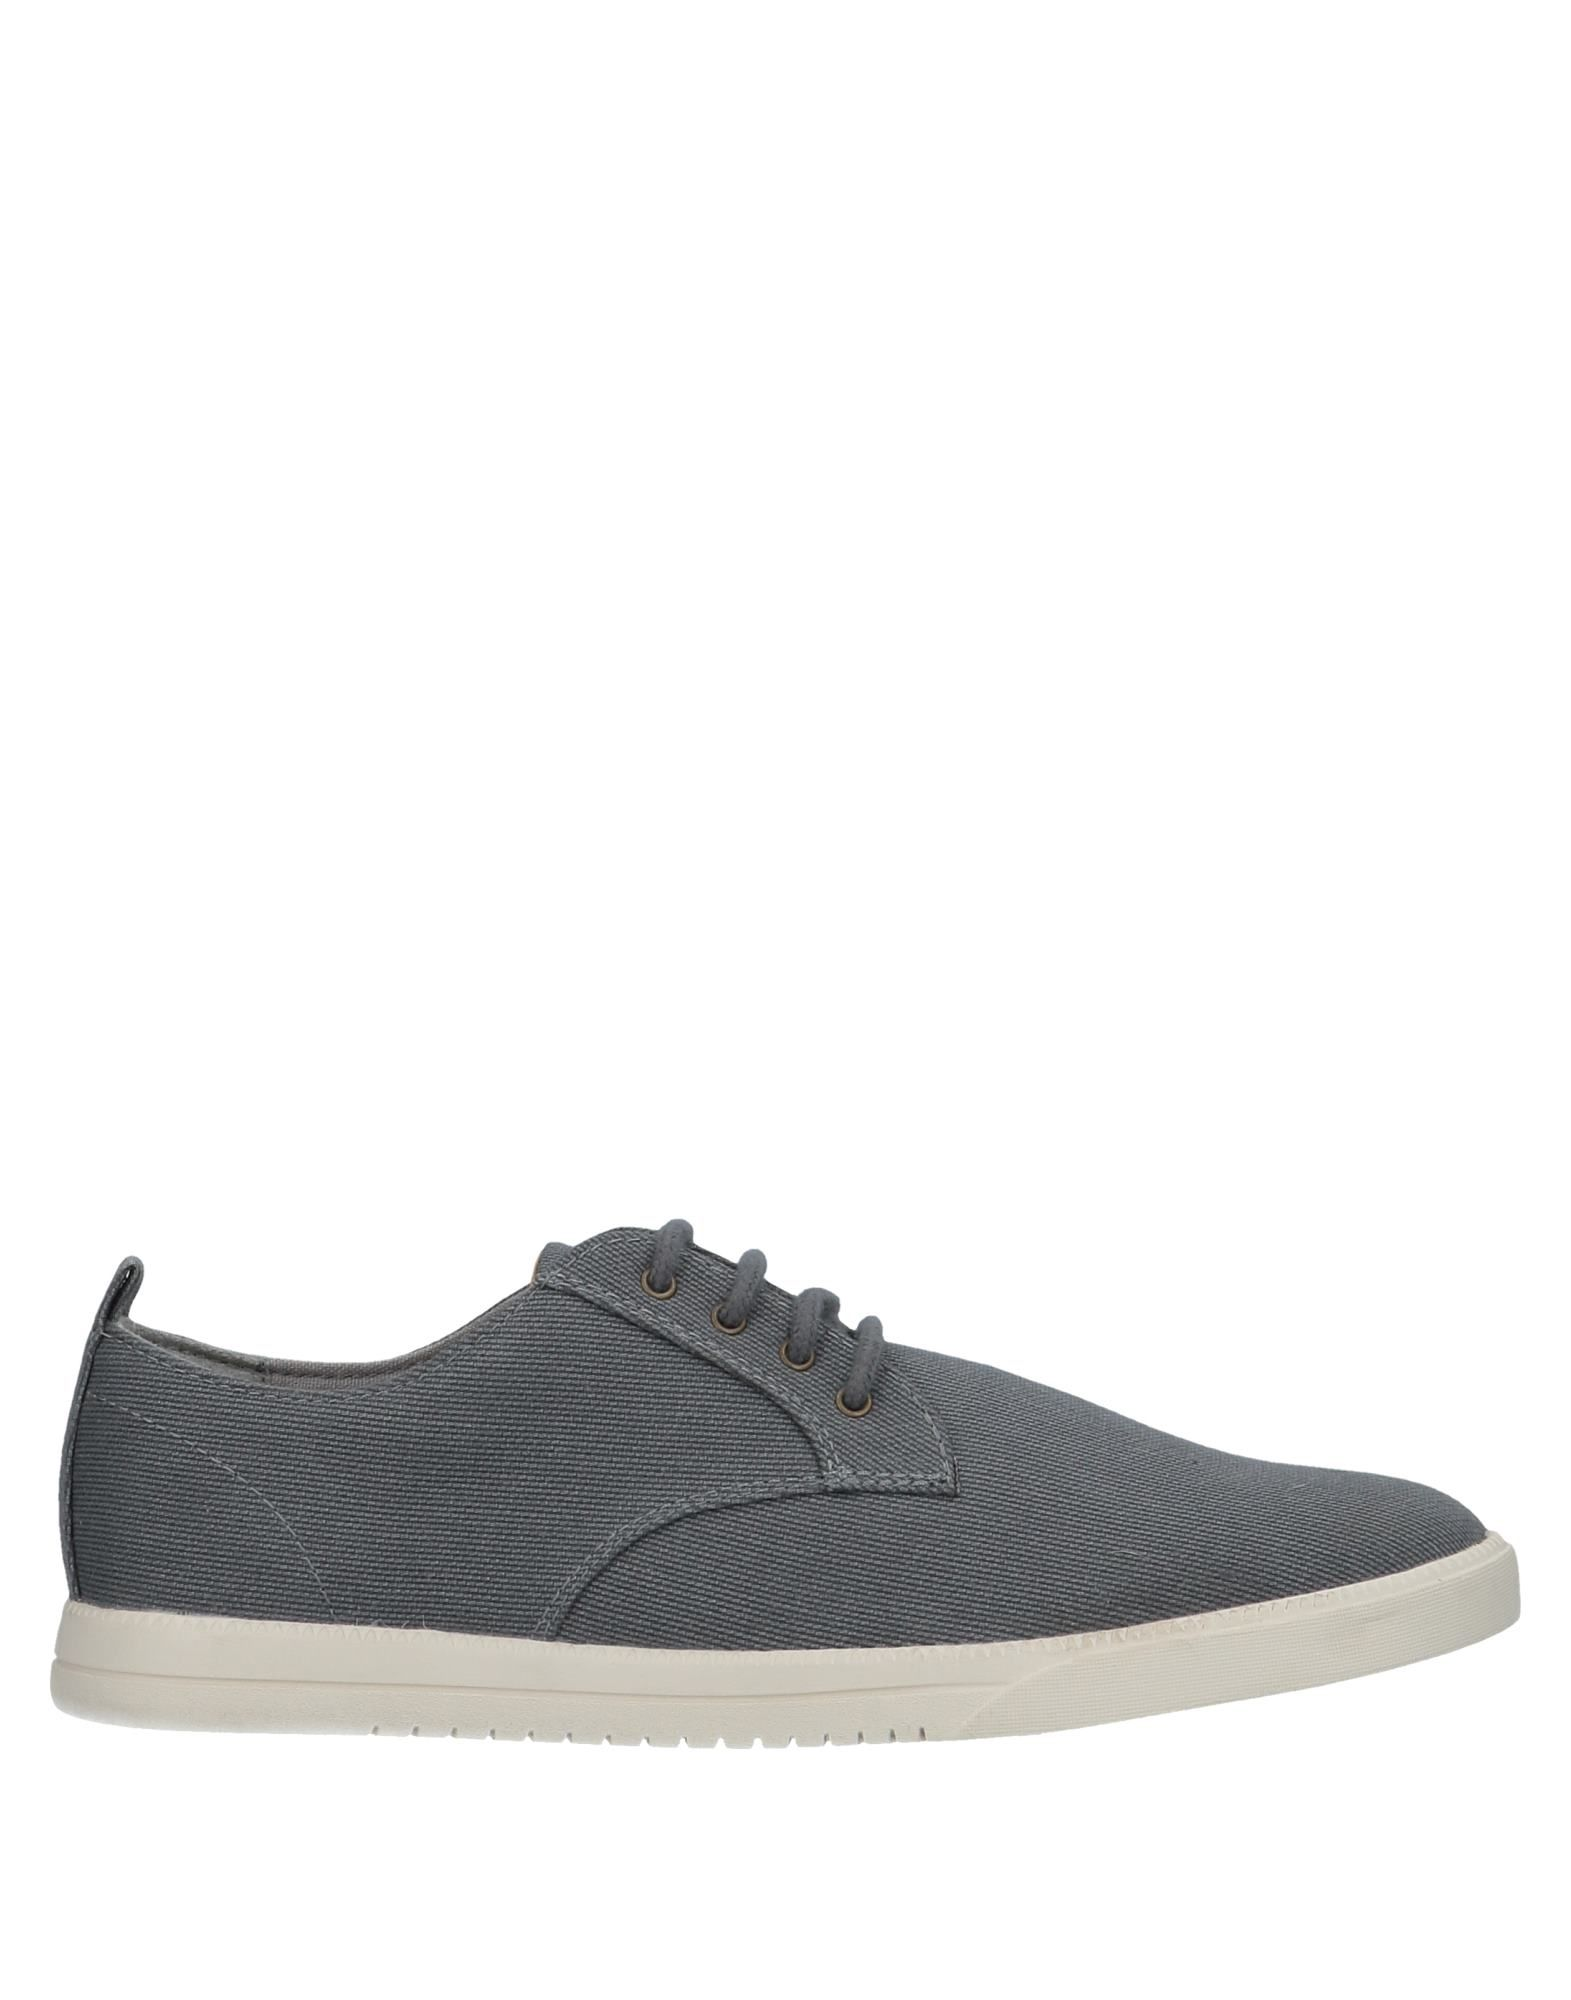 CLAE Обувь на шнурках обувь 2015 тренды